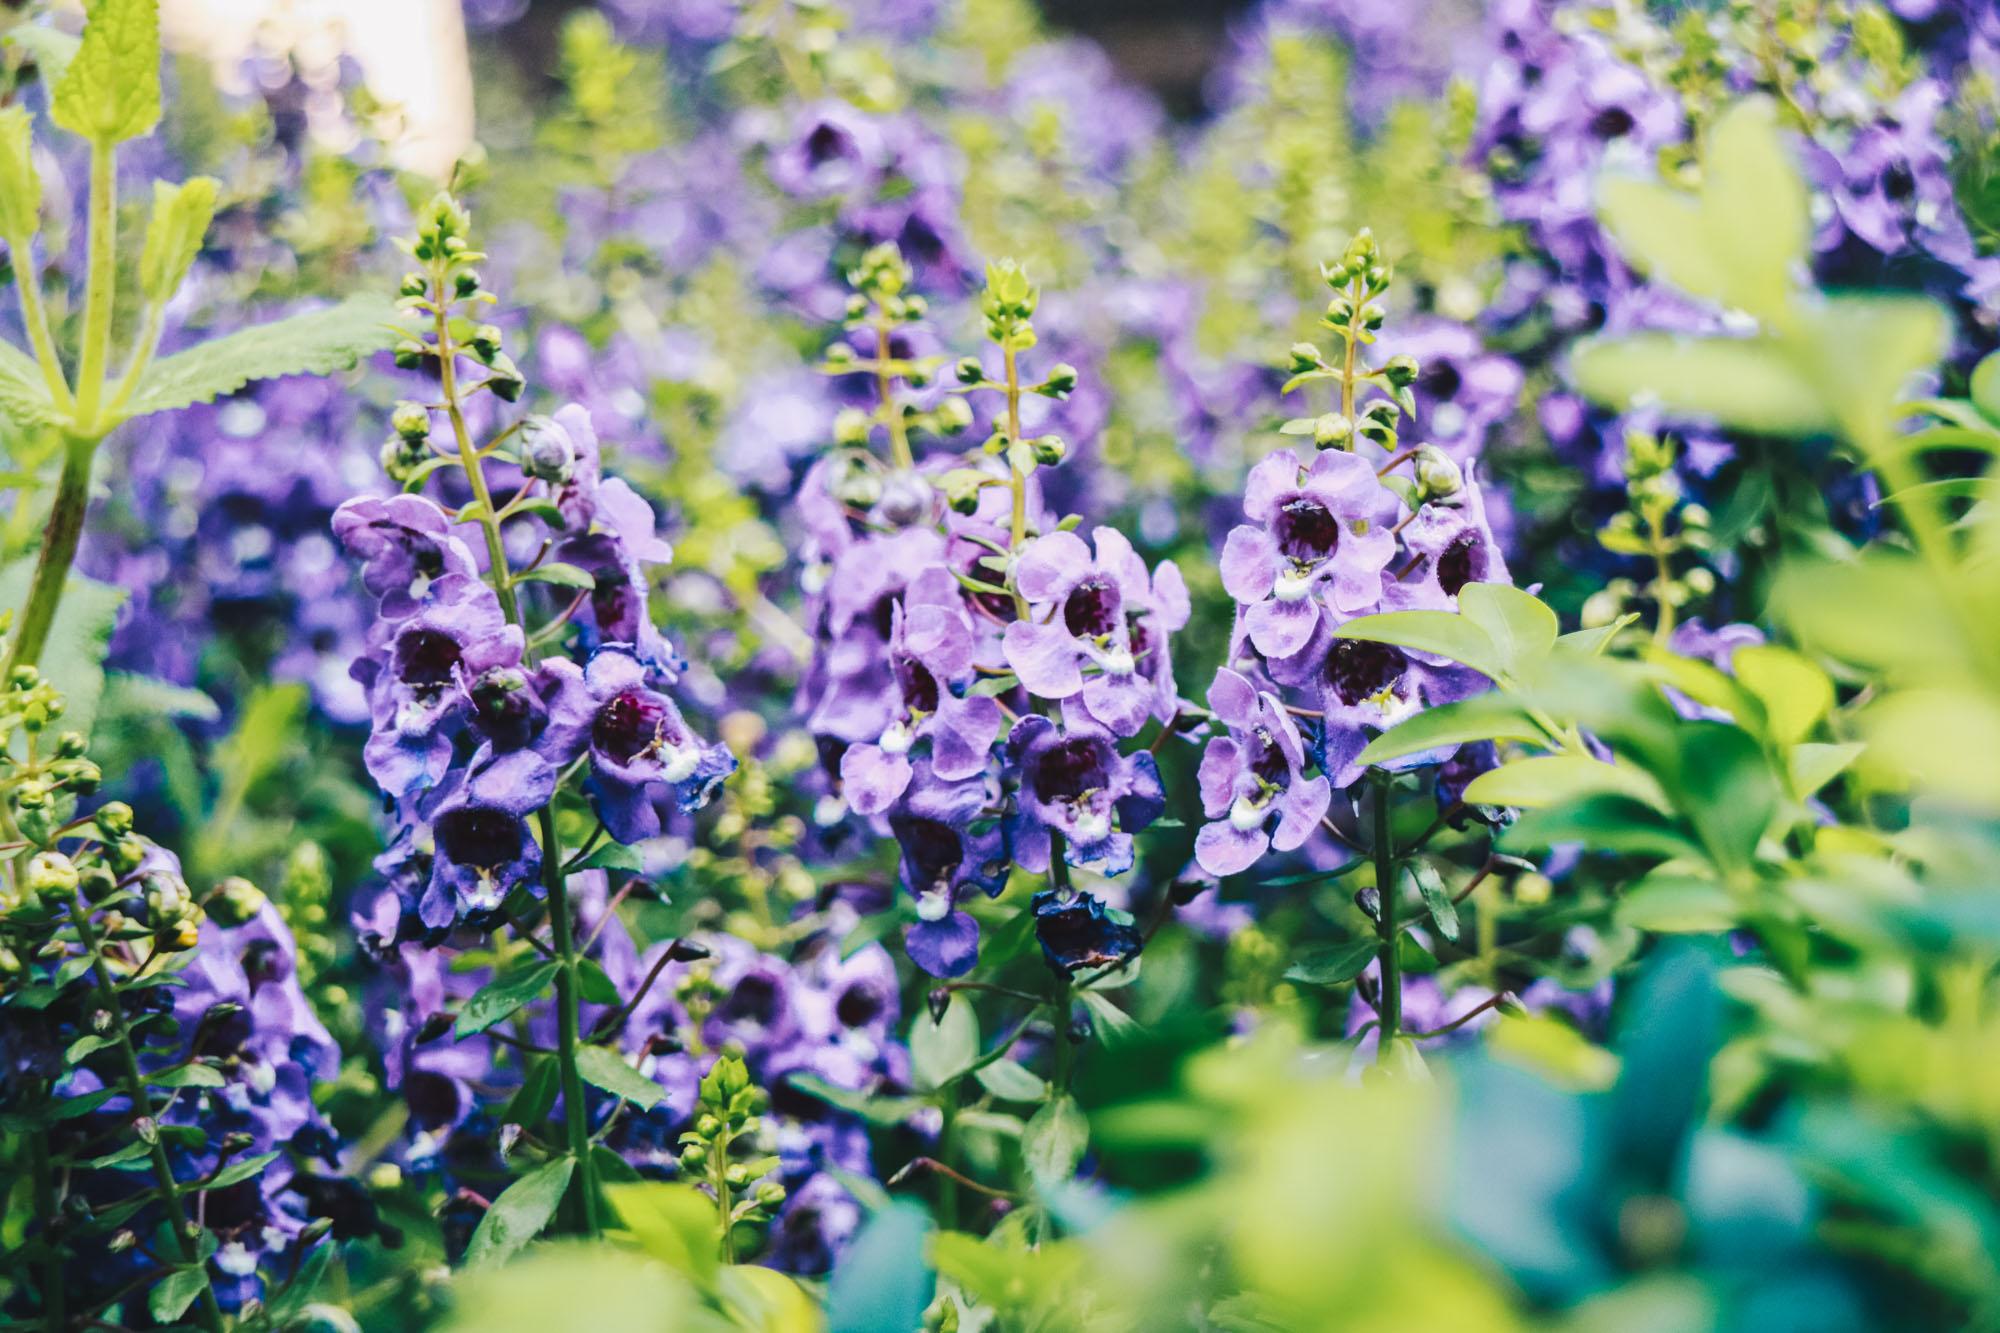 Blue-beauties-floral-display-gardensbythebay-darrenbloggie8